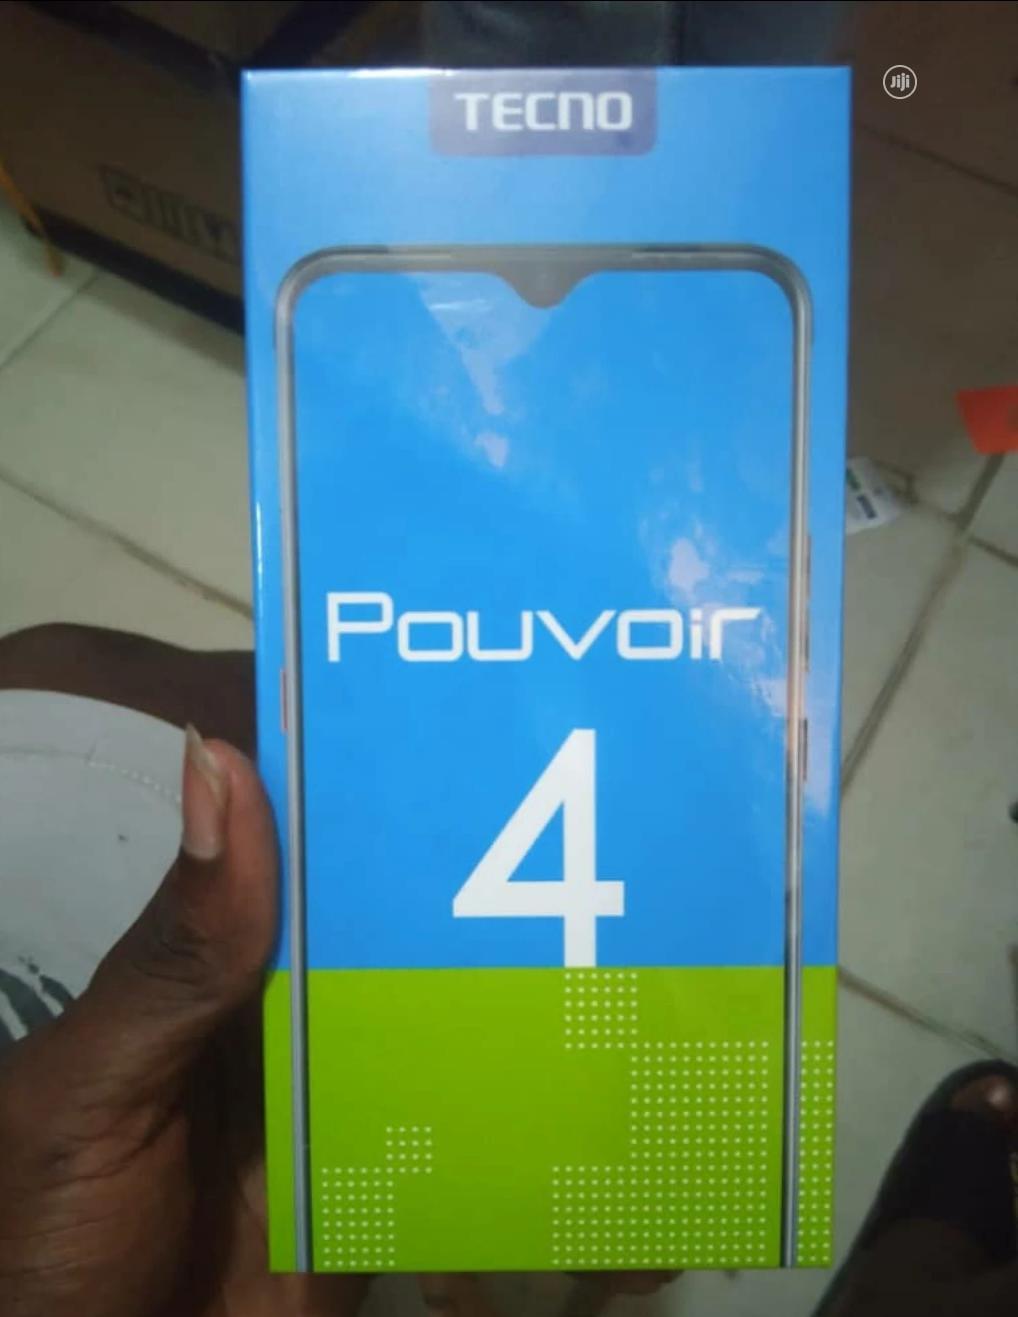 New Tecno Pouvoir 4 32 GB | Mobile Phones for sale in Ikeja, Lagos State, Nigeria